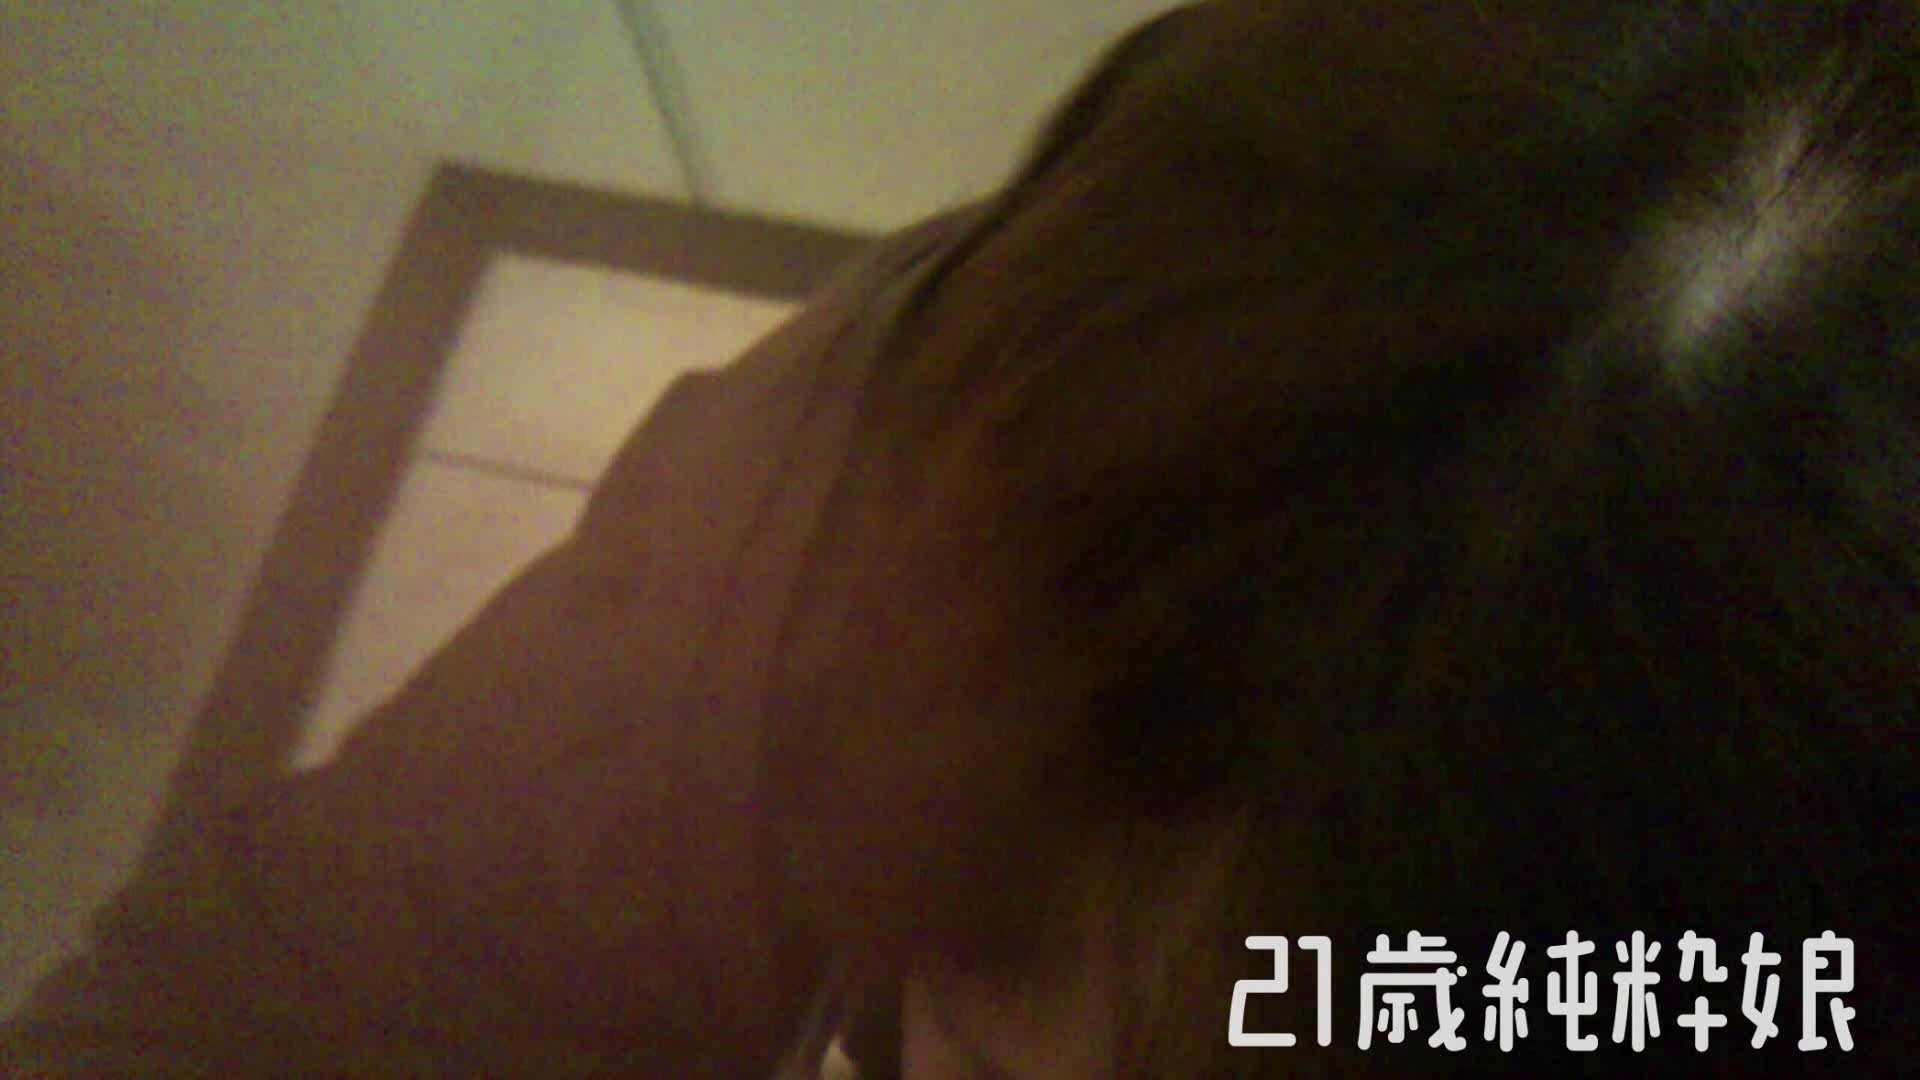 Gカップ21歳純粋嬢第2弾Vol.5 一般投稿 | エッチなOL  77pic 40